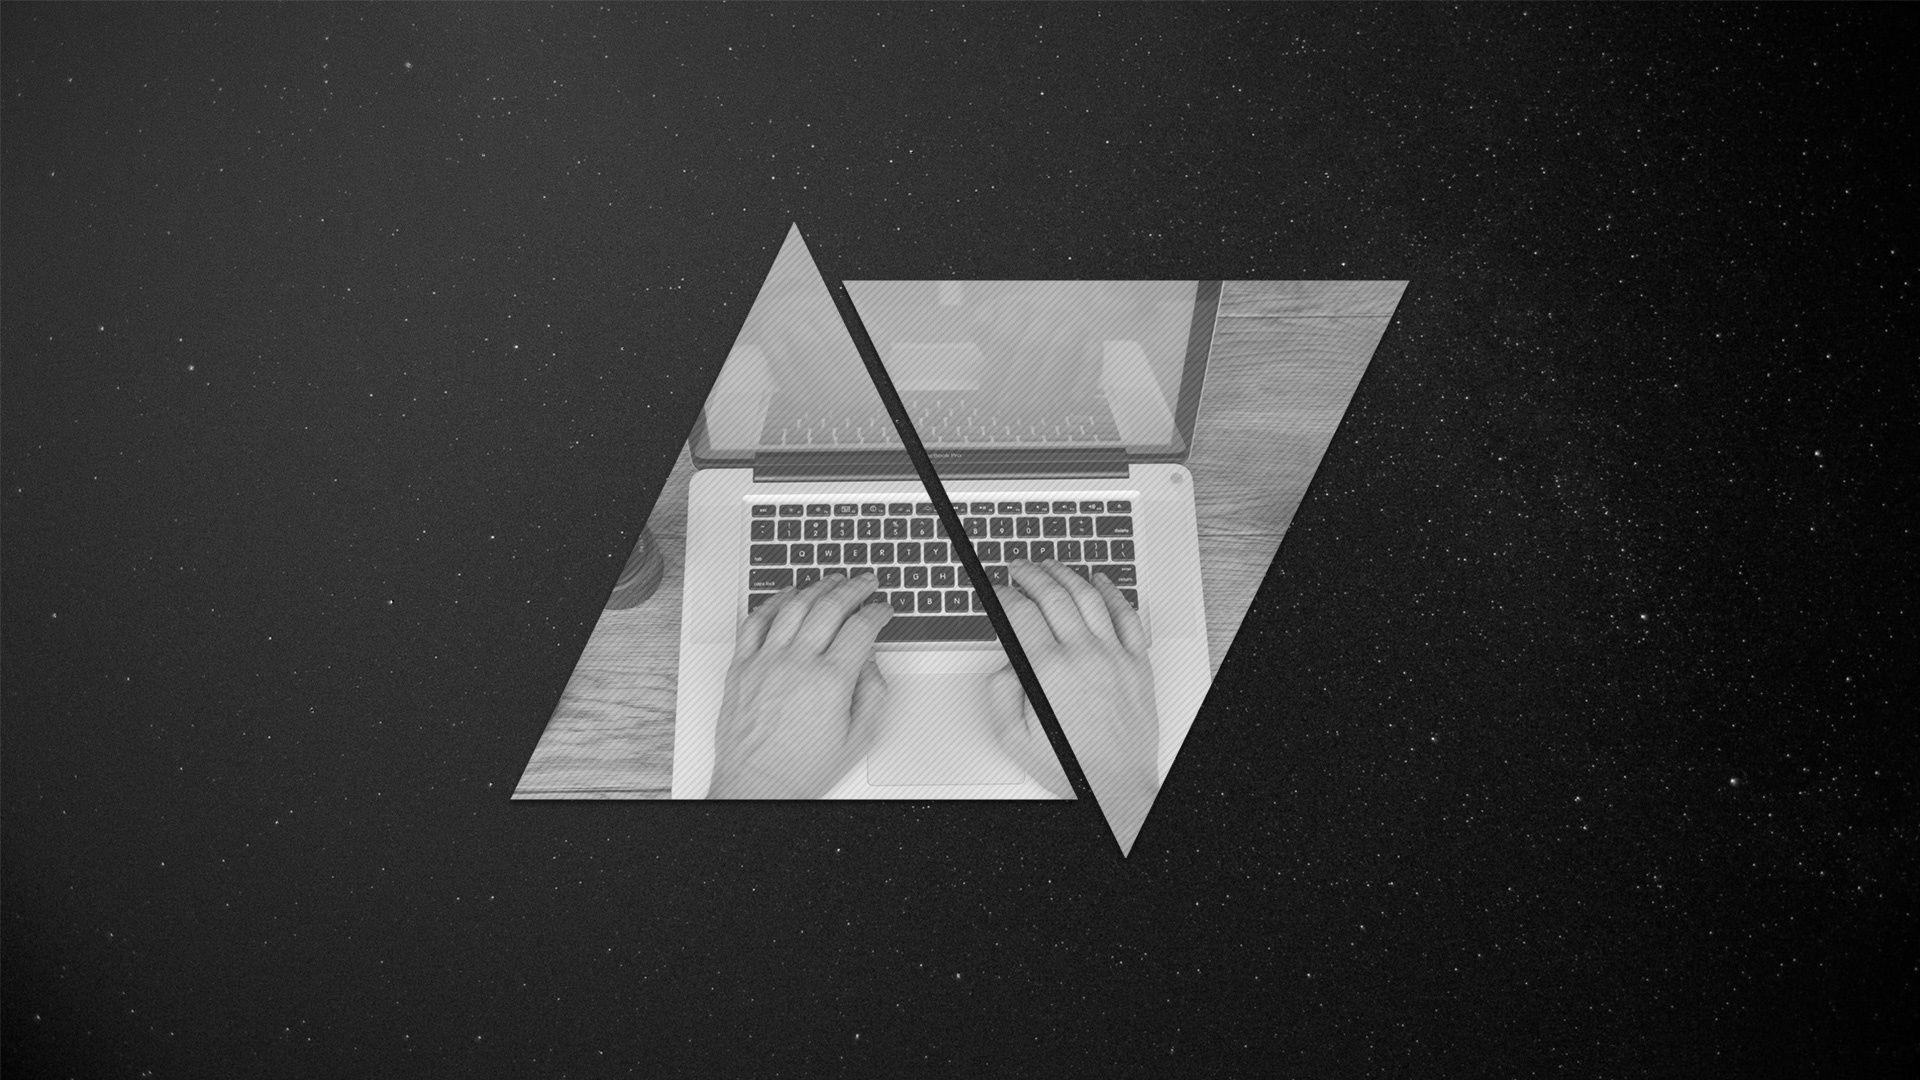 Coding desktop